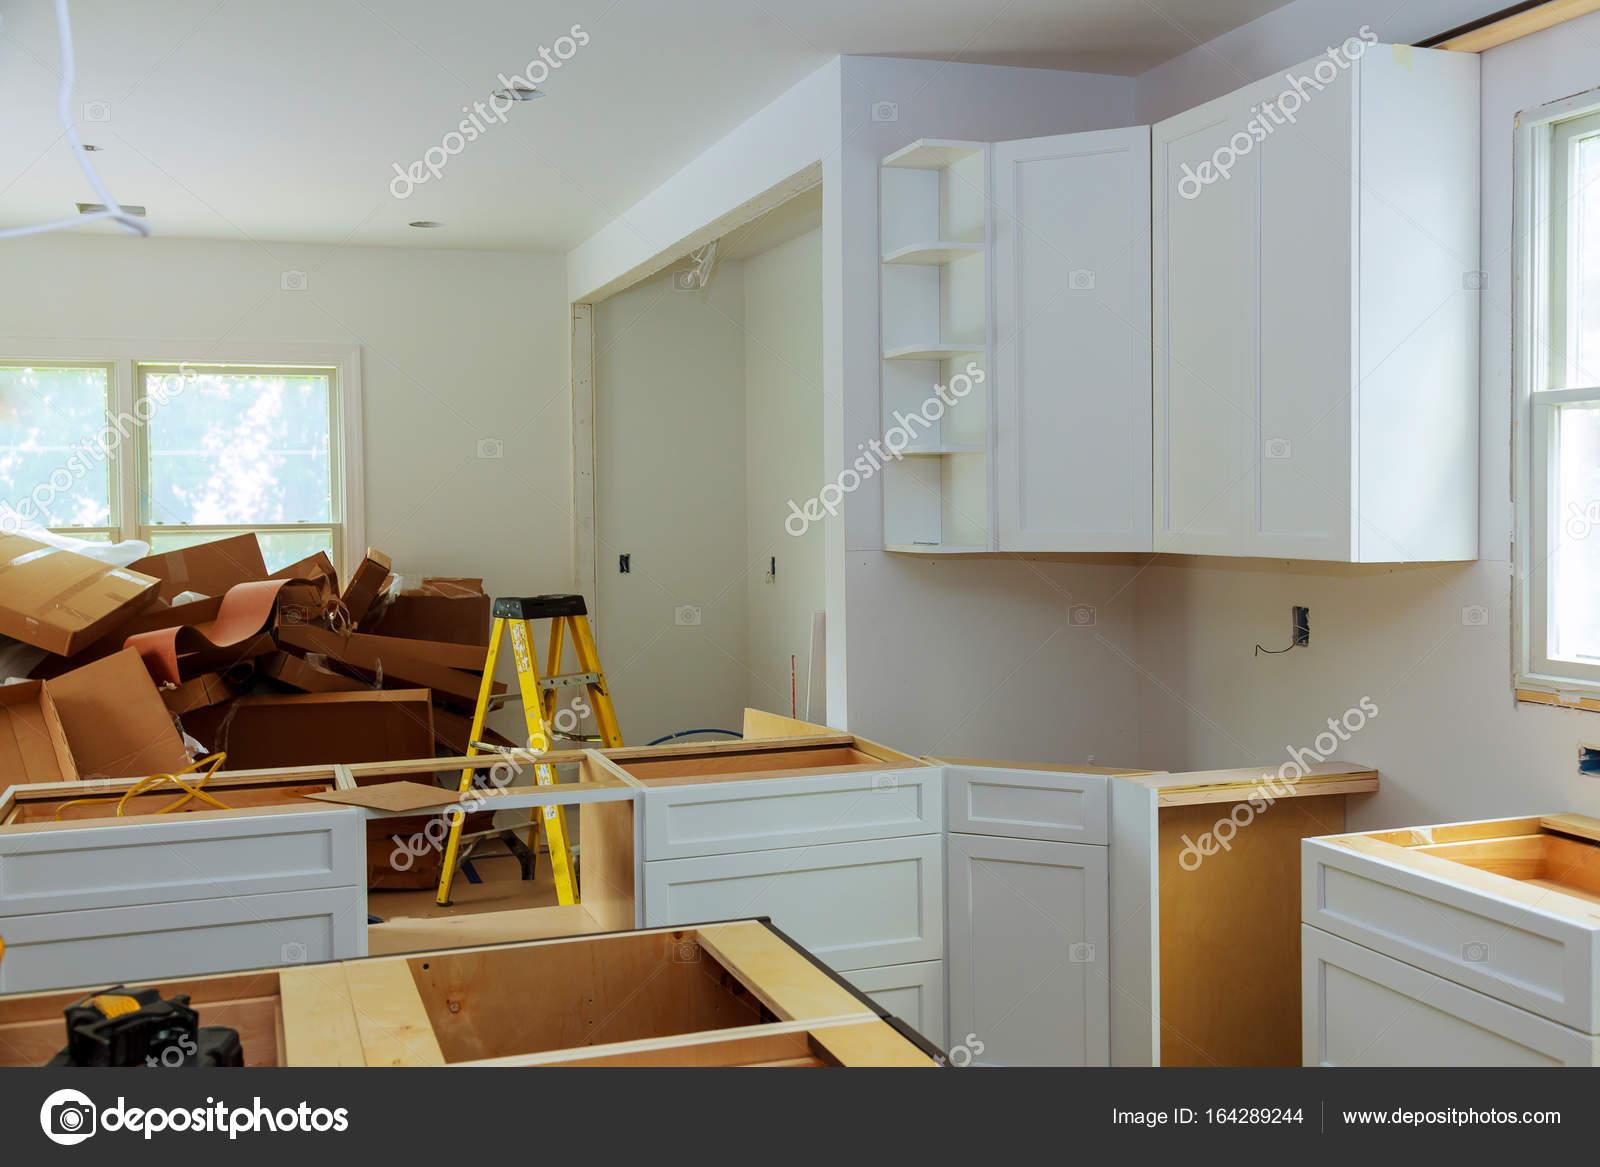 base kitchen cabinets cost of remodelling a 自定义厨柜处于不同的安装阶段 图库照片 c photovs 164289244 自定义厨柜处于不同阶段的安装基地在中心安装厨柜的岛 照片作者photovs